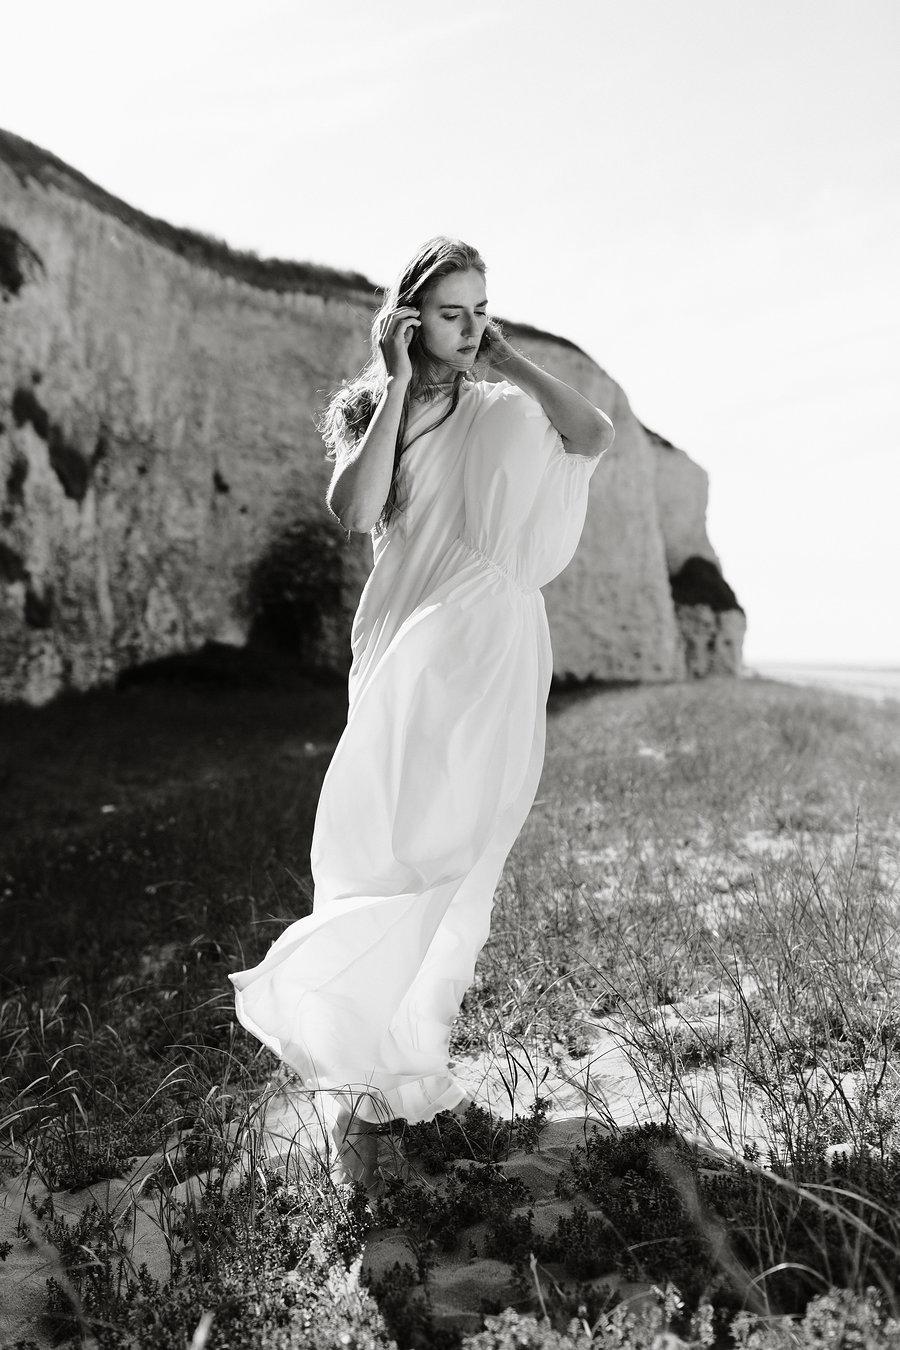 Aphrodite Bridal Collection / Stylist Makatza, Designer Makatza / Uploaded 26th January 2019 @ 01:46 PM